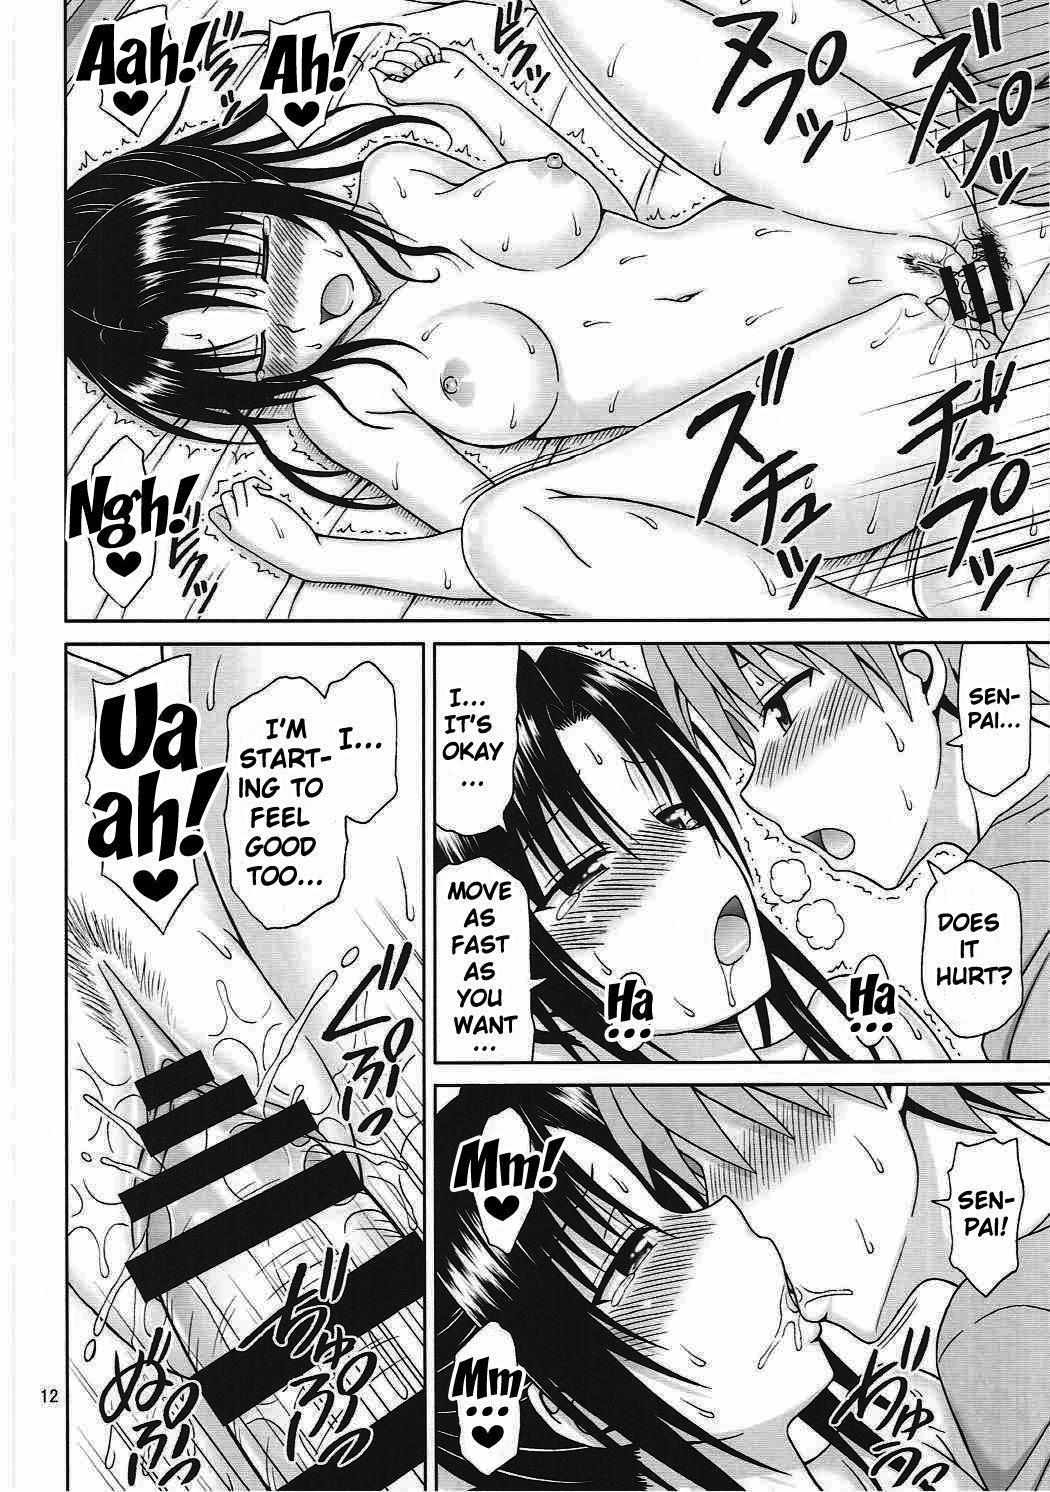 Kujou Senpai no Osasoi wa Kotowarenai!   I Can't Refuse An Invitation From Kujou Senpai 10